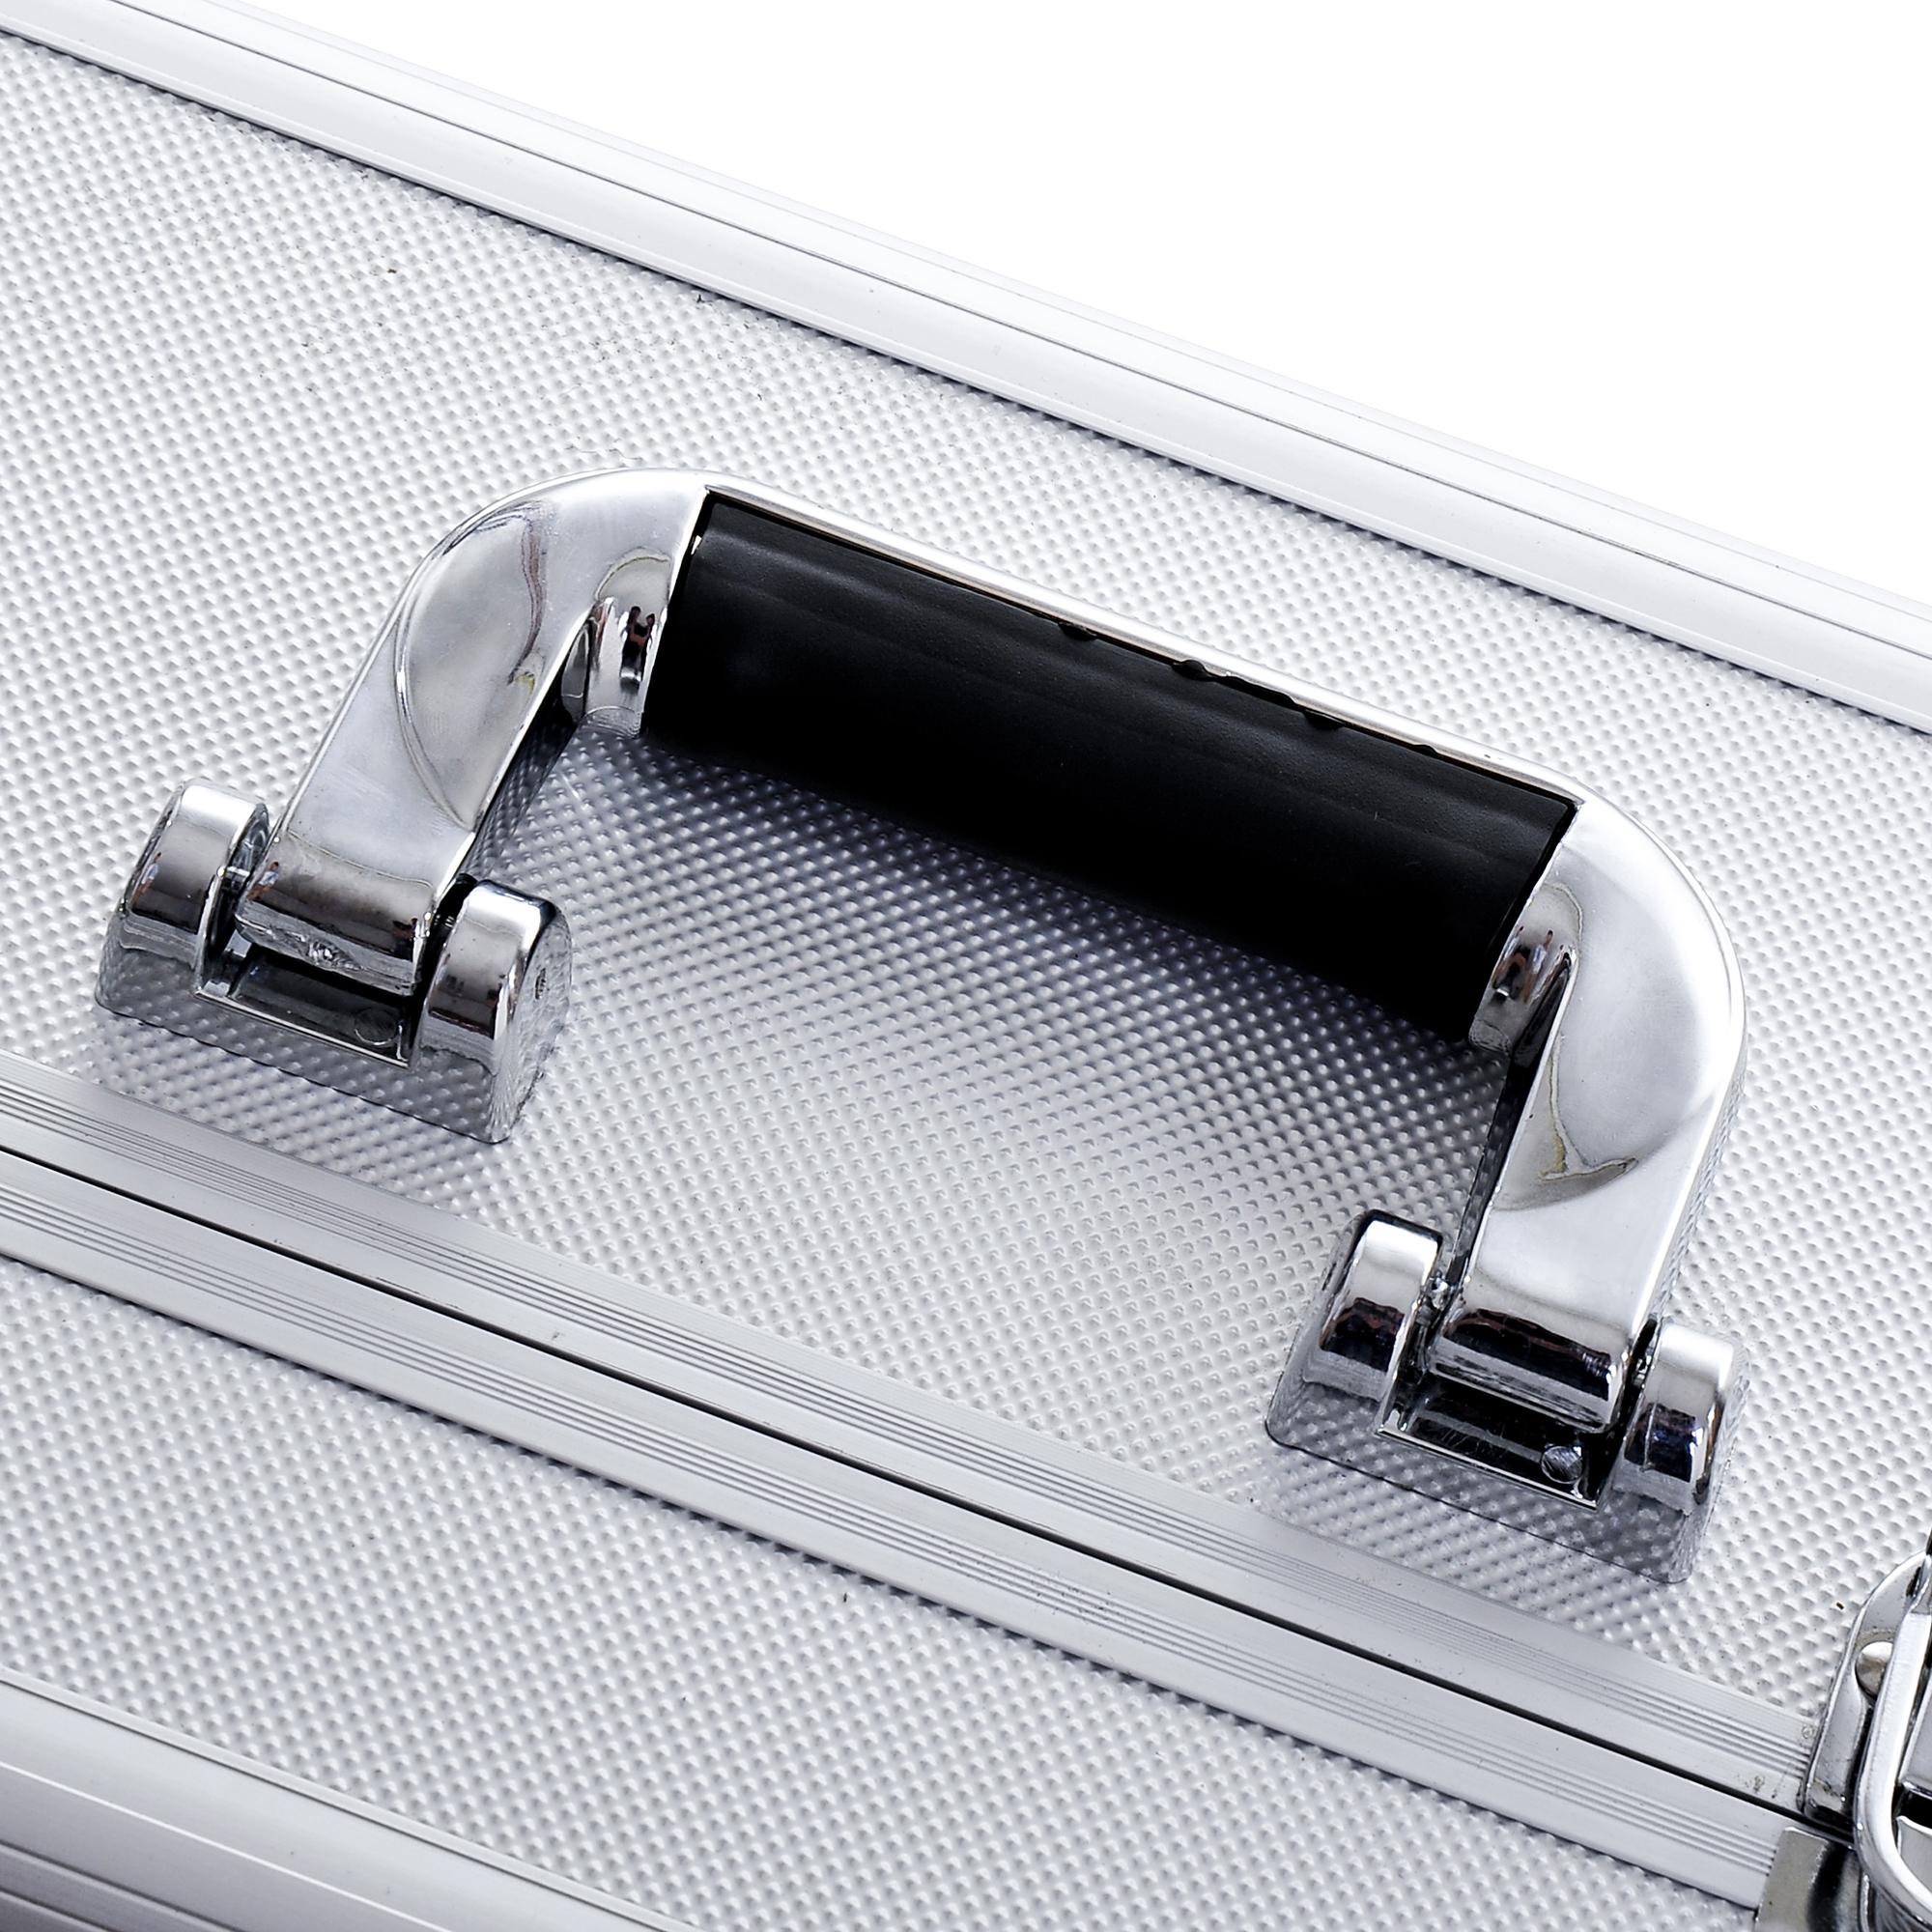 Aluminum-Rolling-Makeup-Train-Case-Trolley-Organizer-Storage-Box-Lockable thumbnail 21